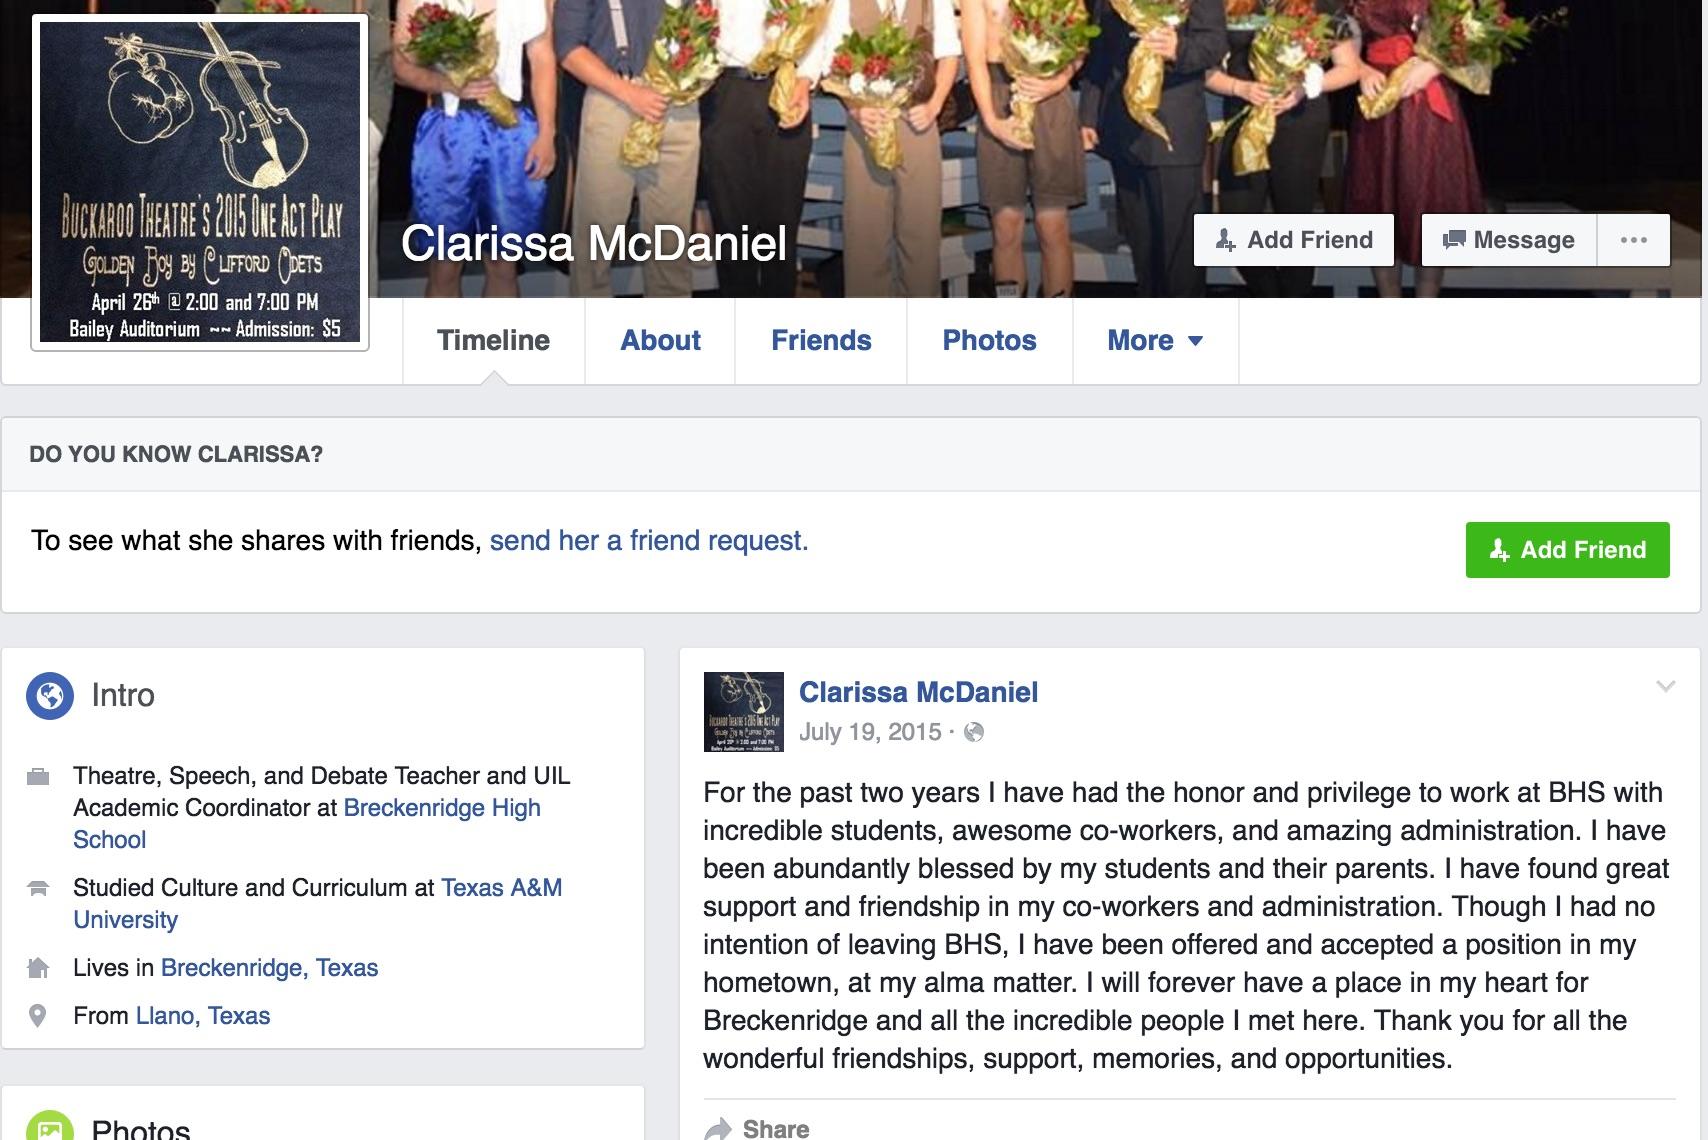 clarissa mcdaniel twitter, clarissa mcdaniel, clarissa mcdaniel llano texas, clarissa mcdaniel llano, clarissa mcdaniel photos, clarissa mcdaniel facebook, clarissa mcdaniel teacher